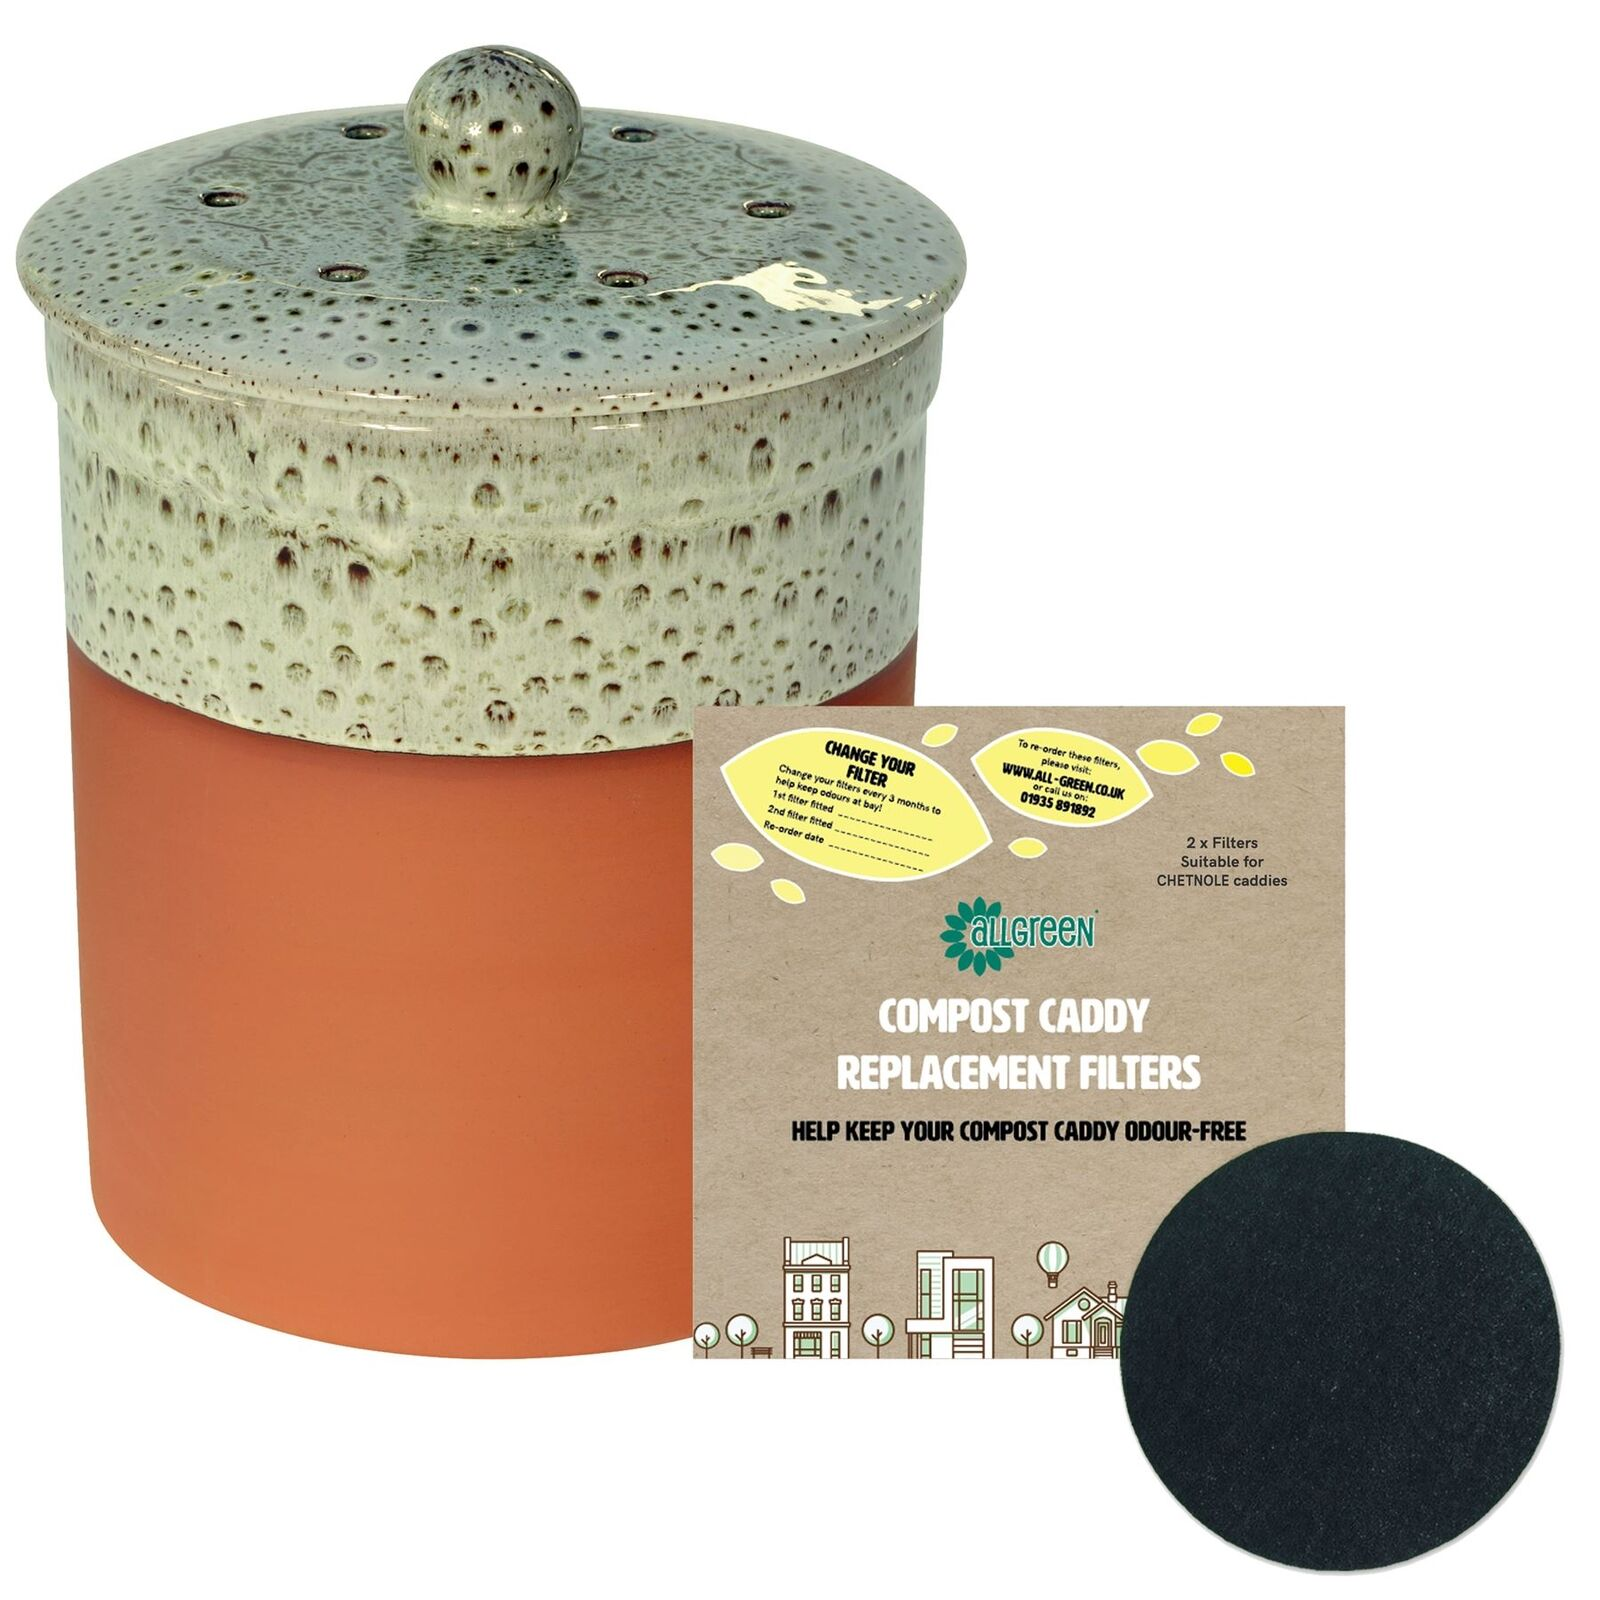 Chetnole Terracotta Caddy -Olive Grün- Ceramic Compost Bin & 2xFilters